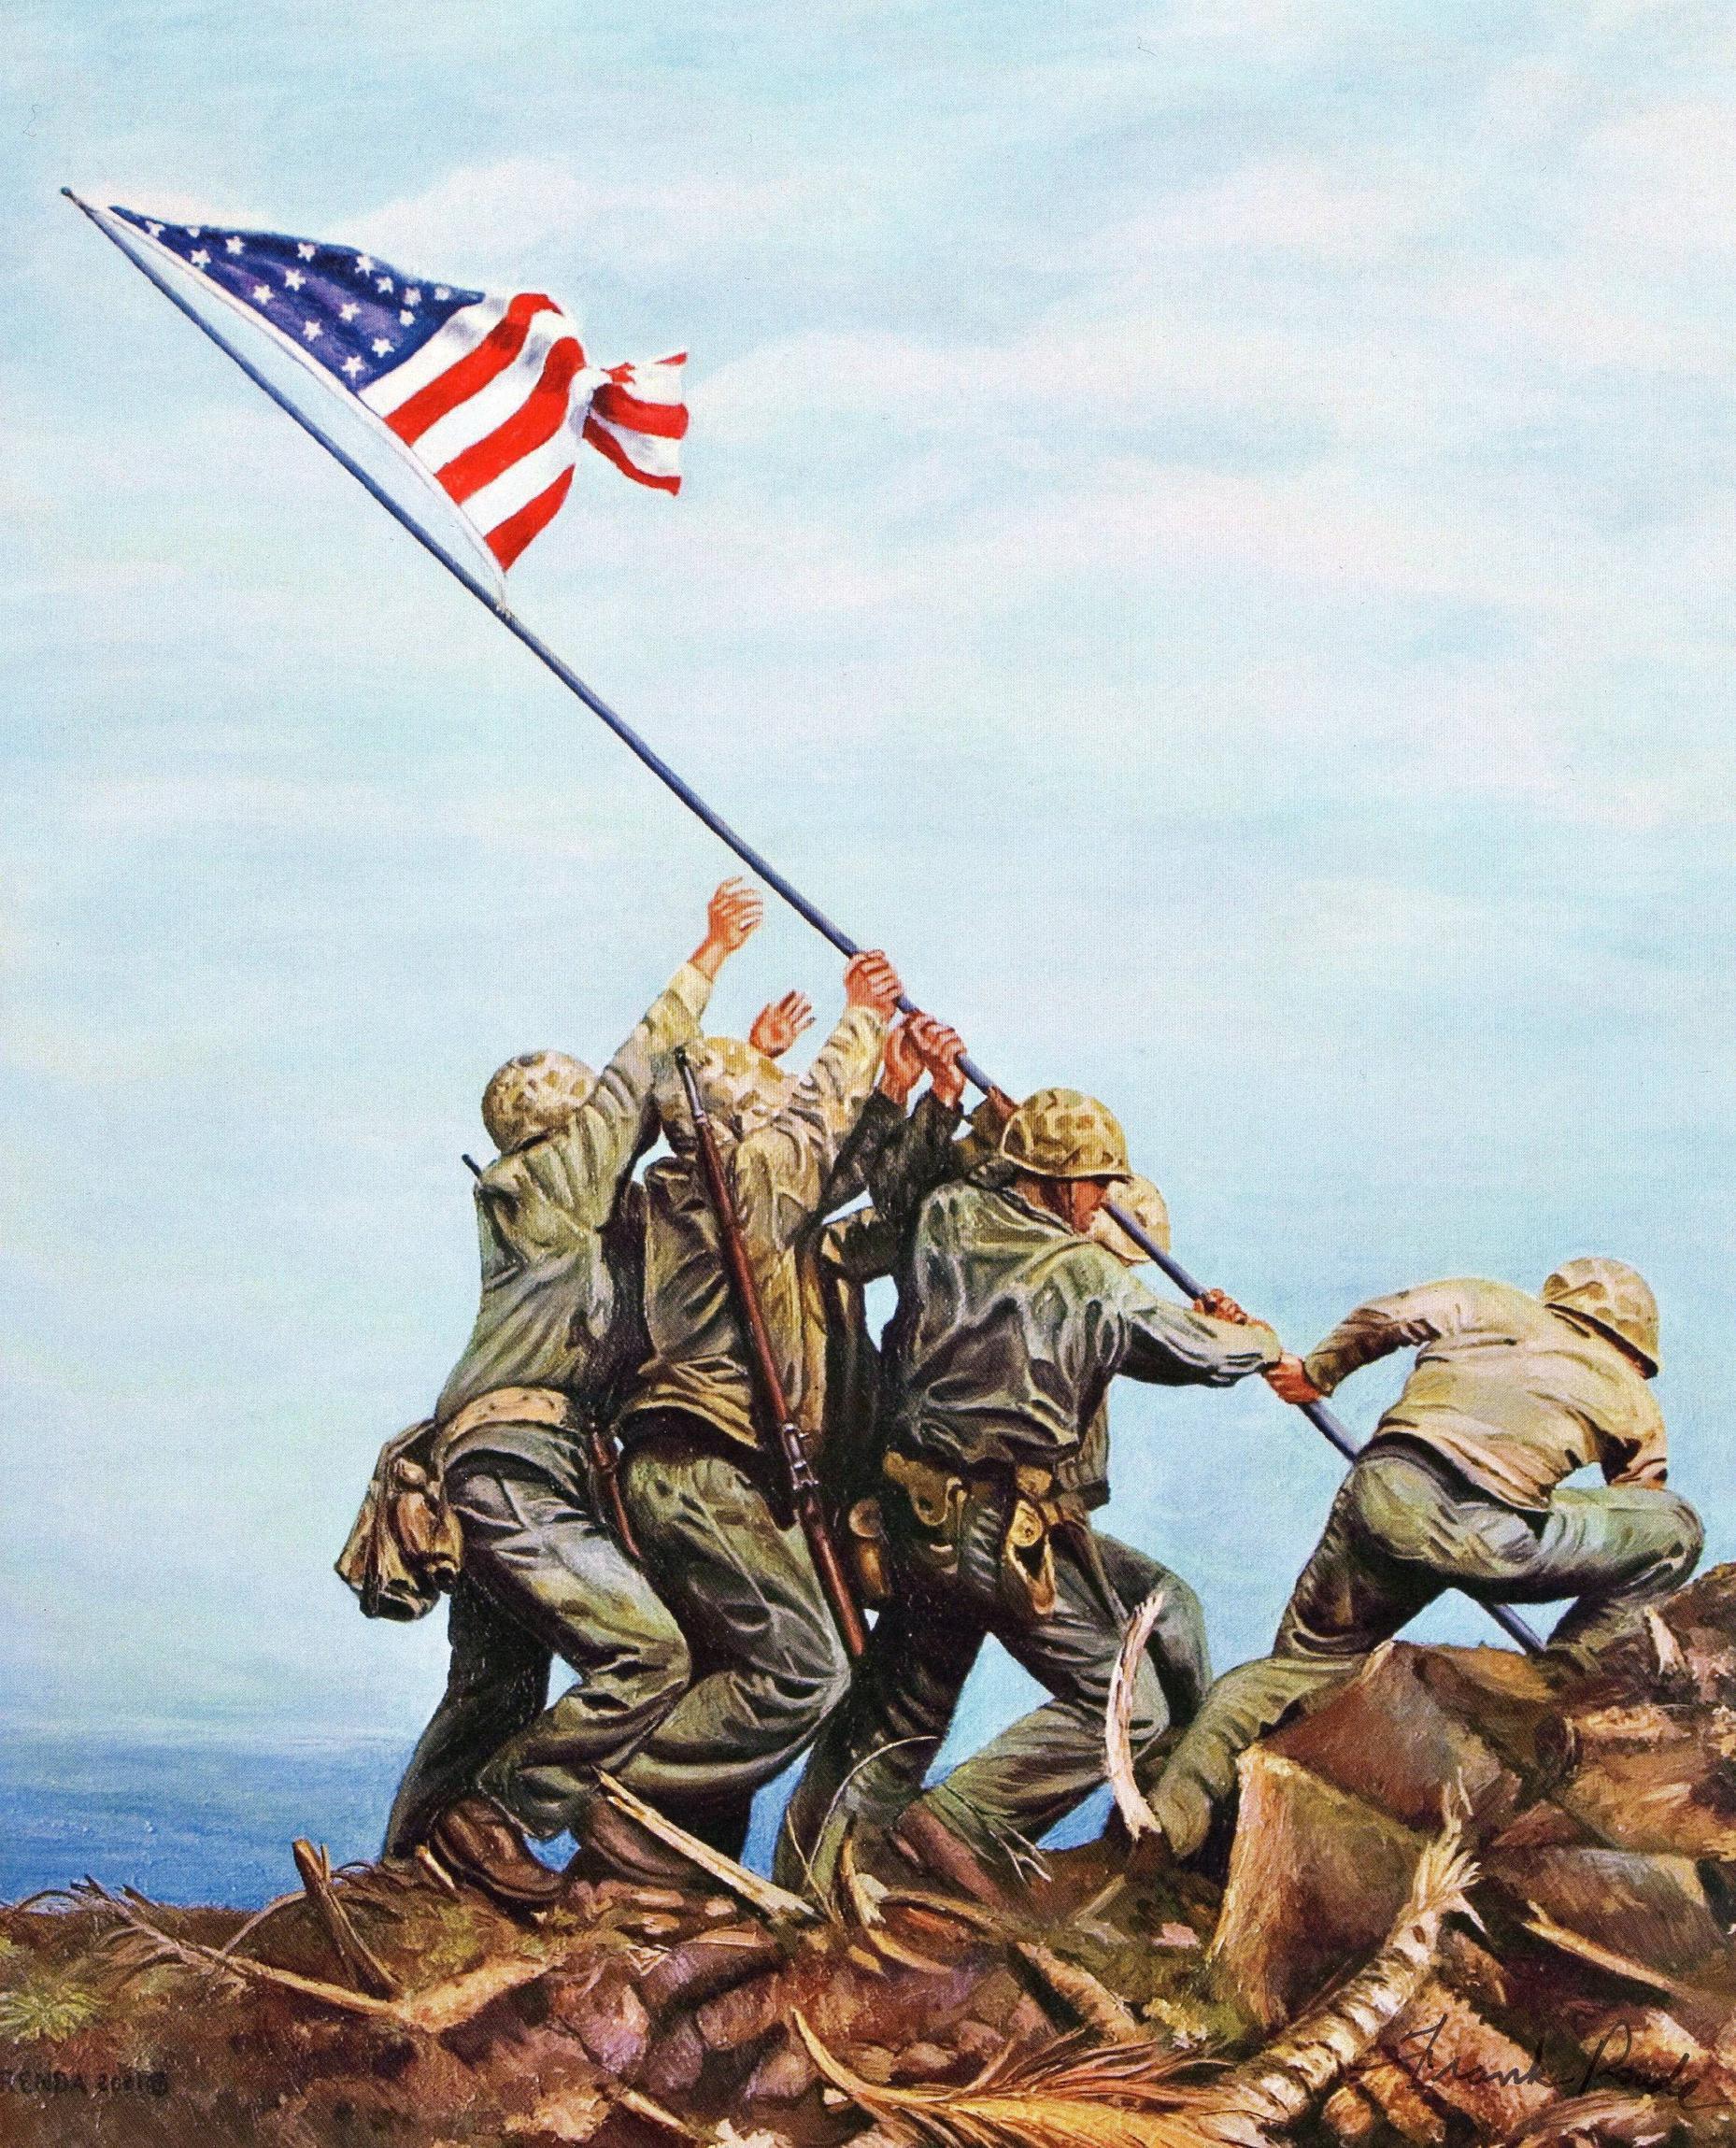 Iwo Jima Flag Raising Wallpapers - Wallpaper Cave Raising